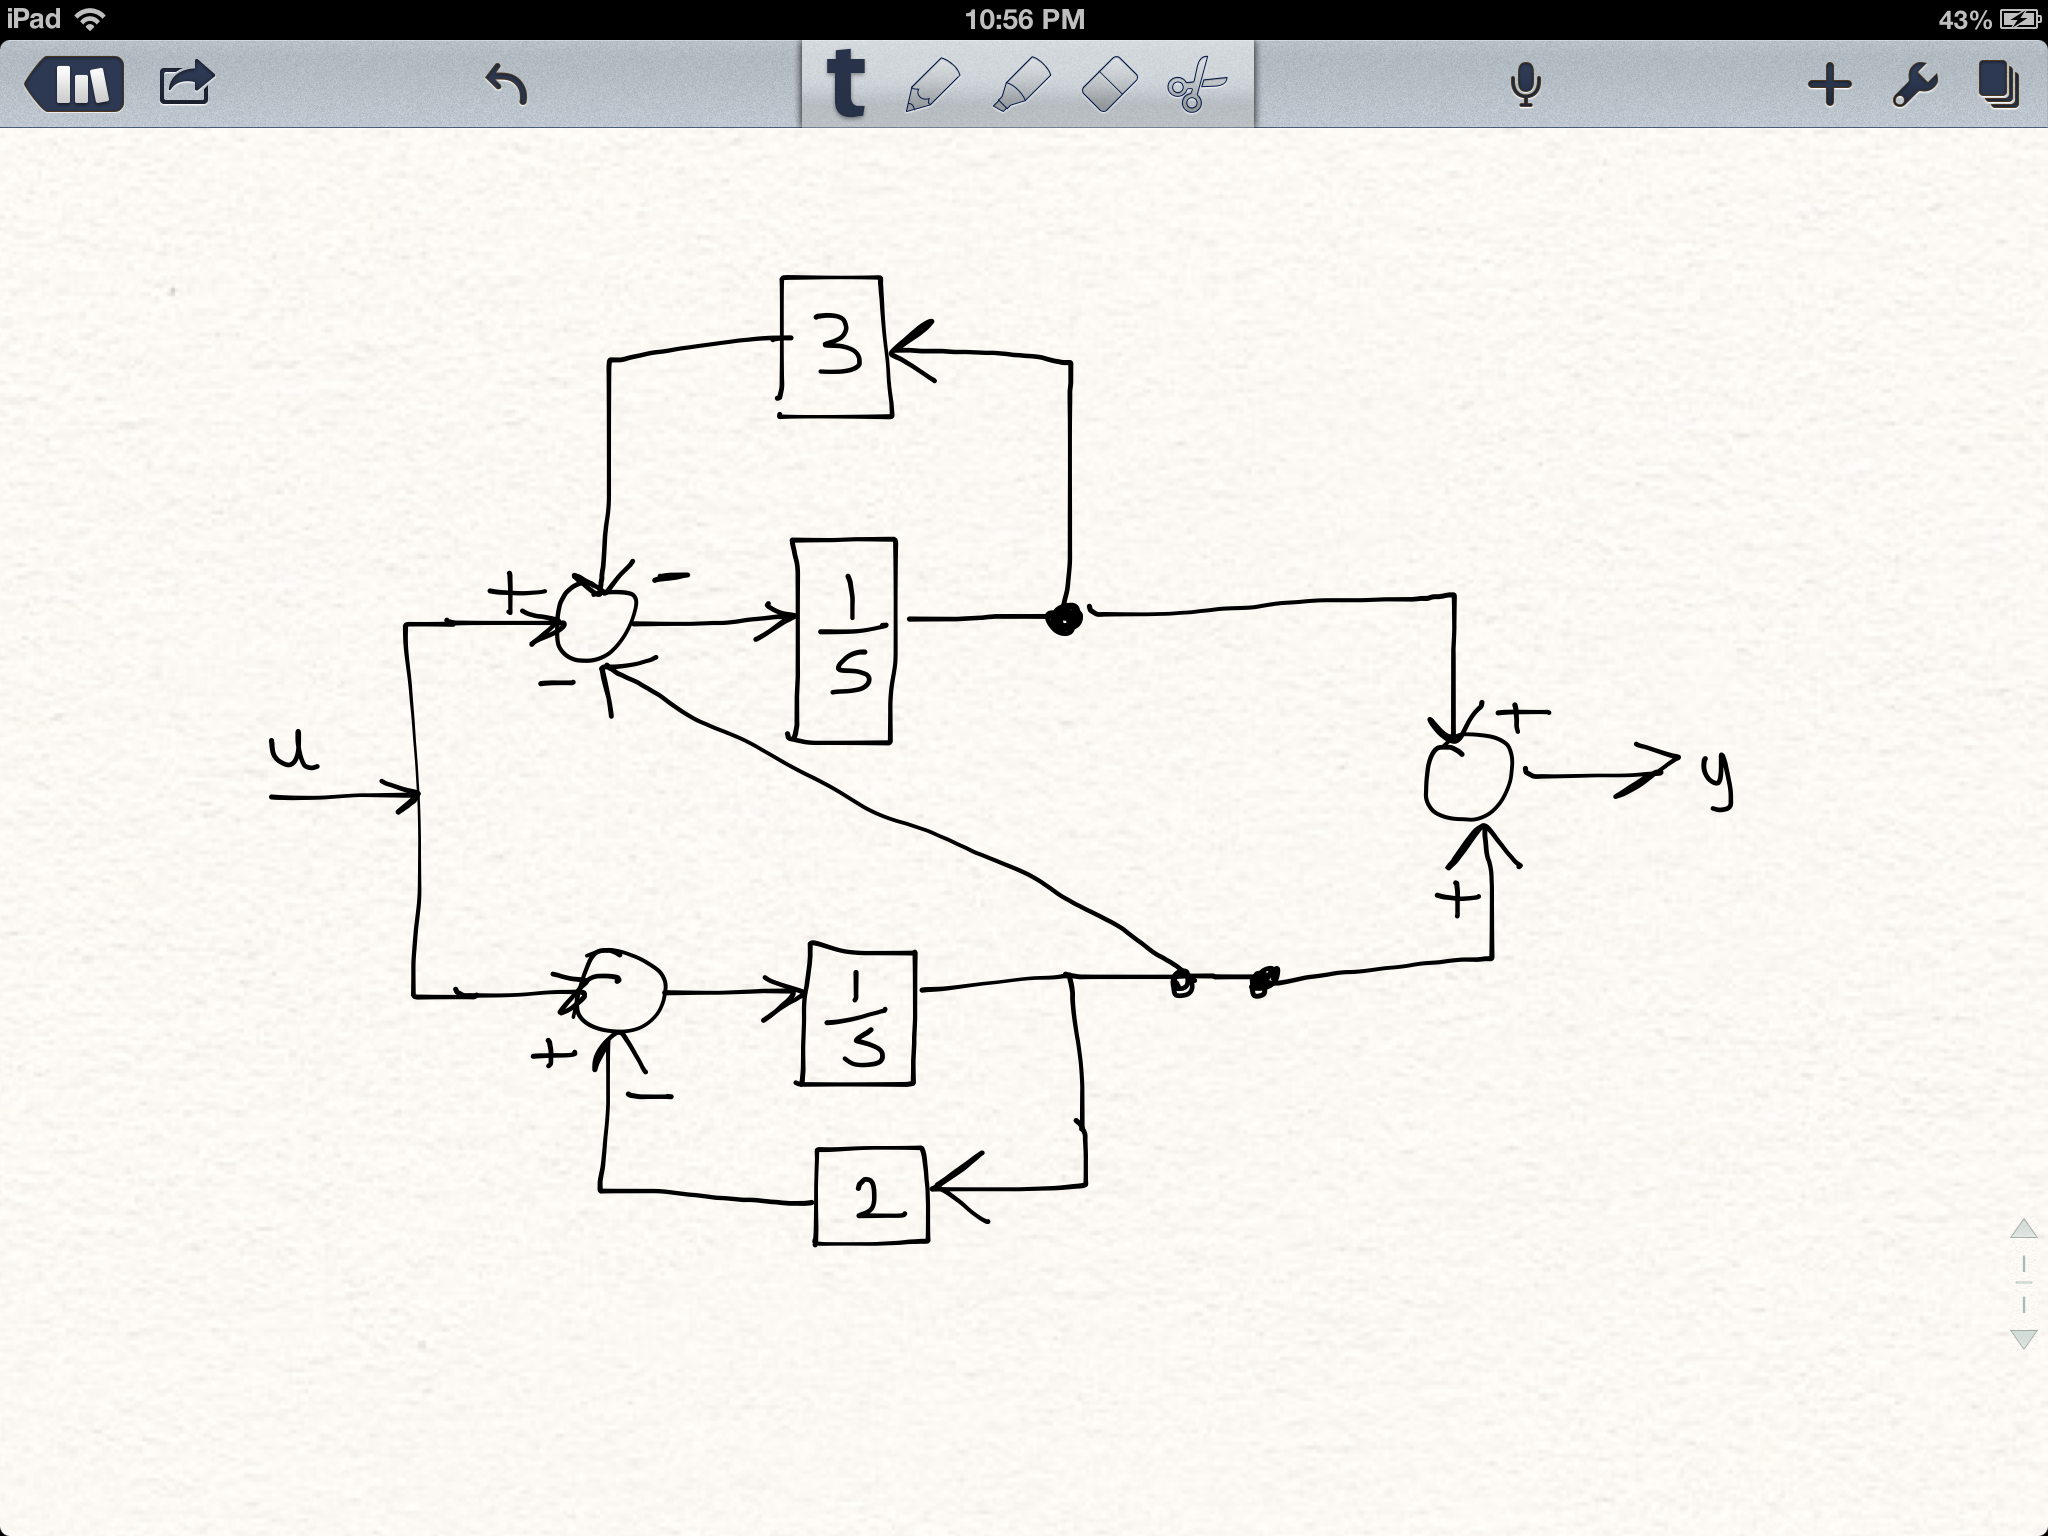 Block diagram example best program to create a website baseball comfortable block diagram example images simple wiring diagram media2f0e52f0e522edd 0fe1 44c8 8204 publicscrutiny Images